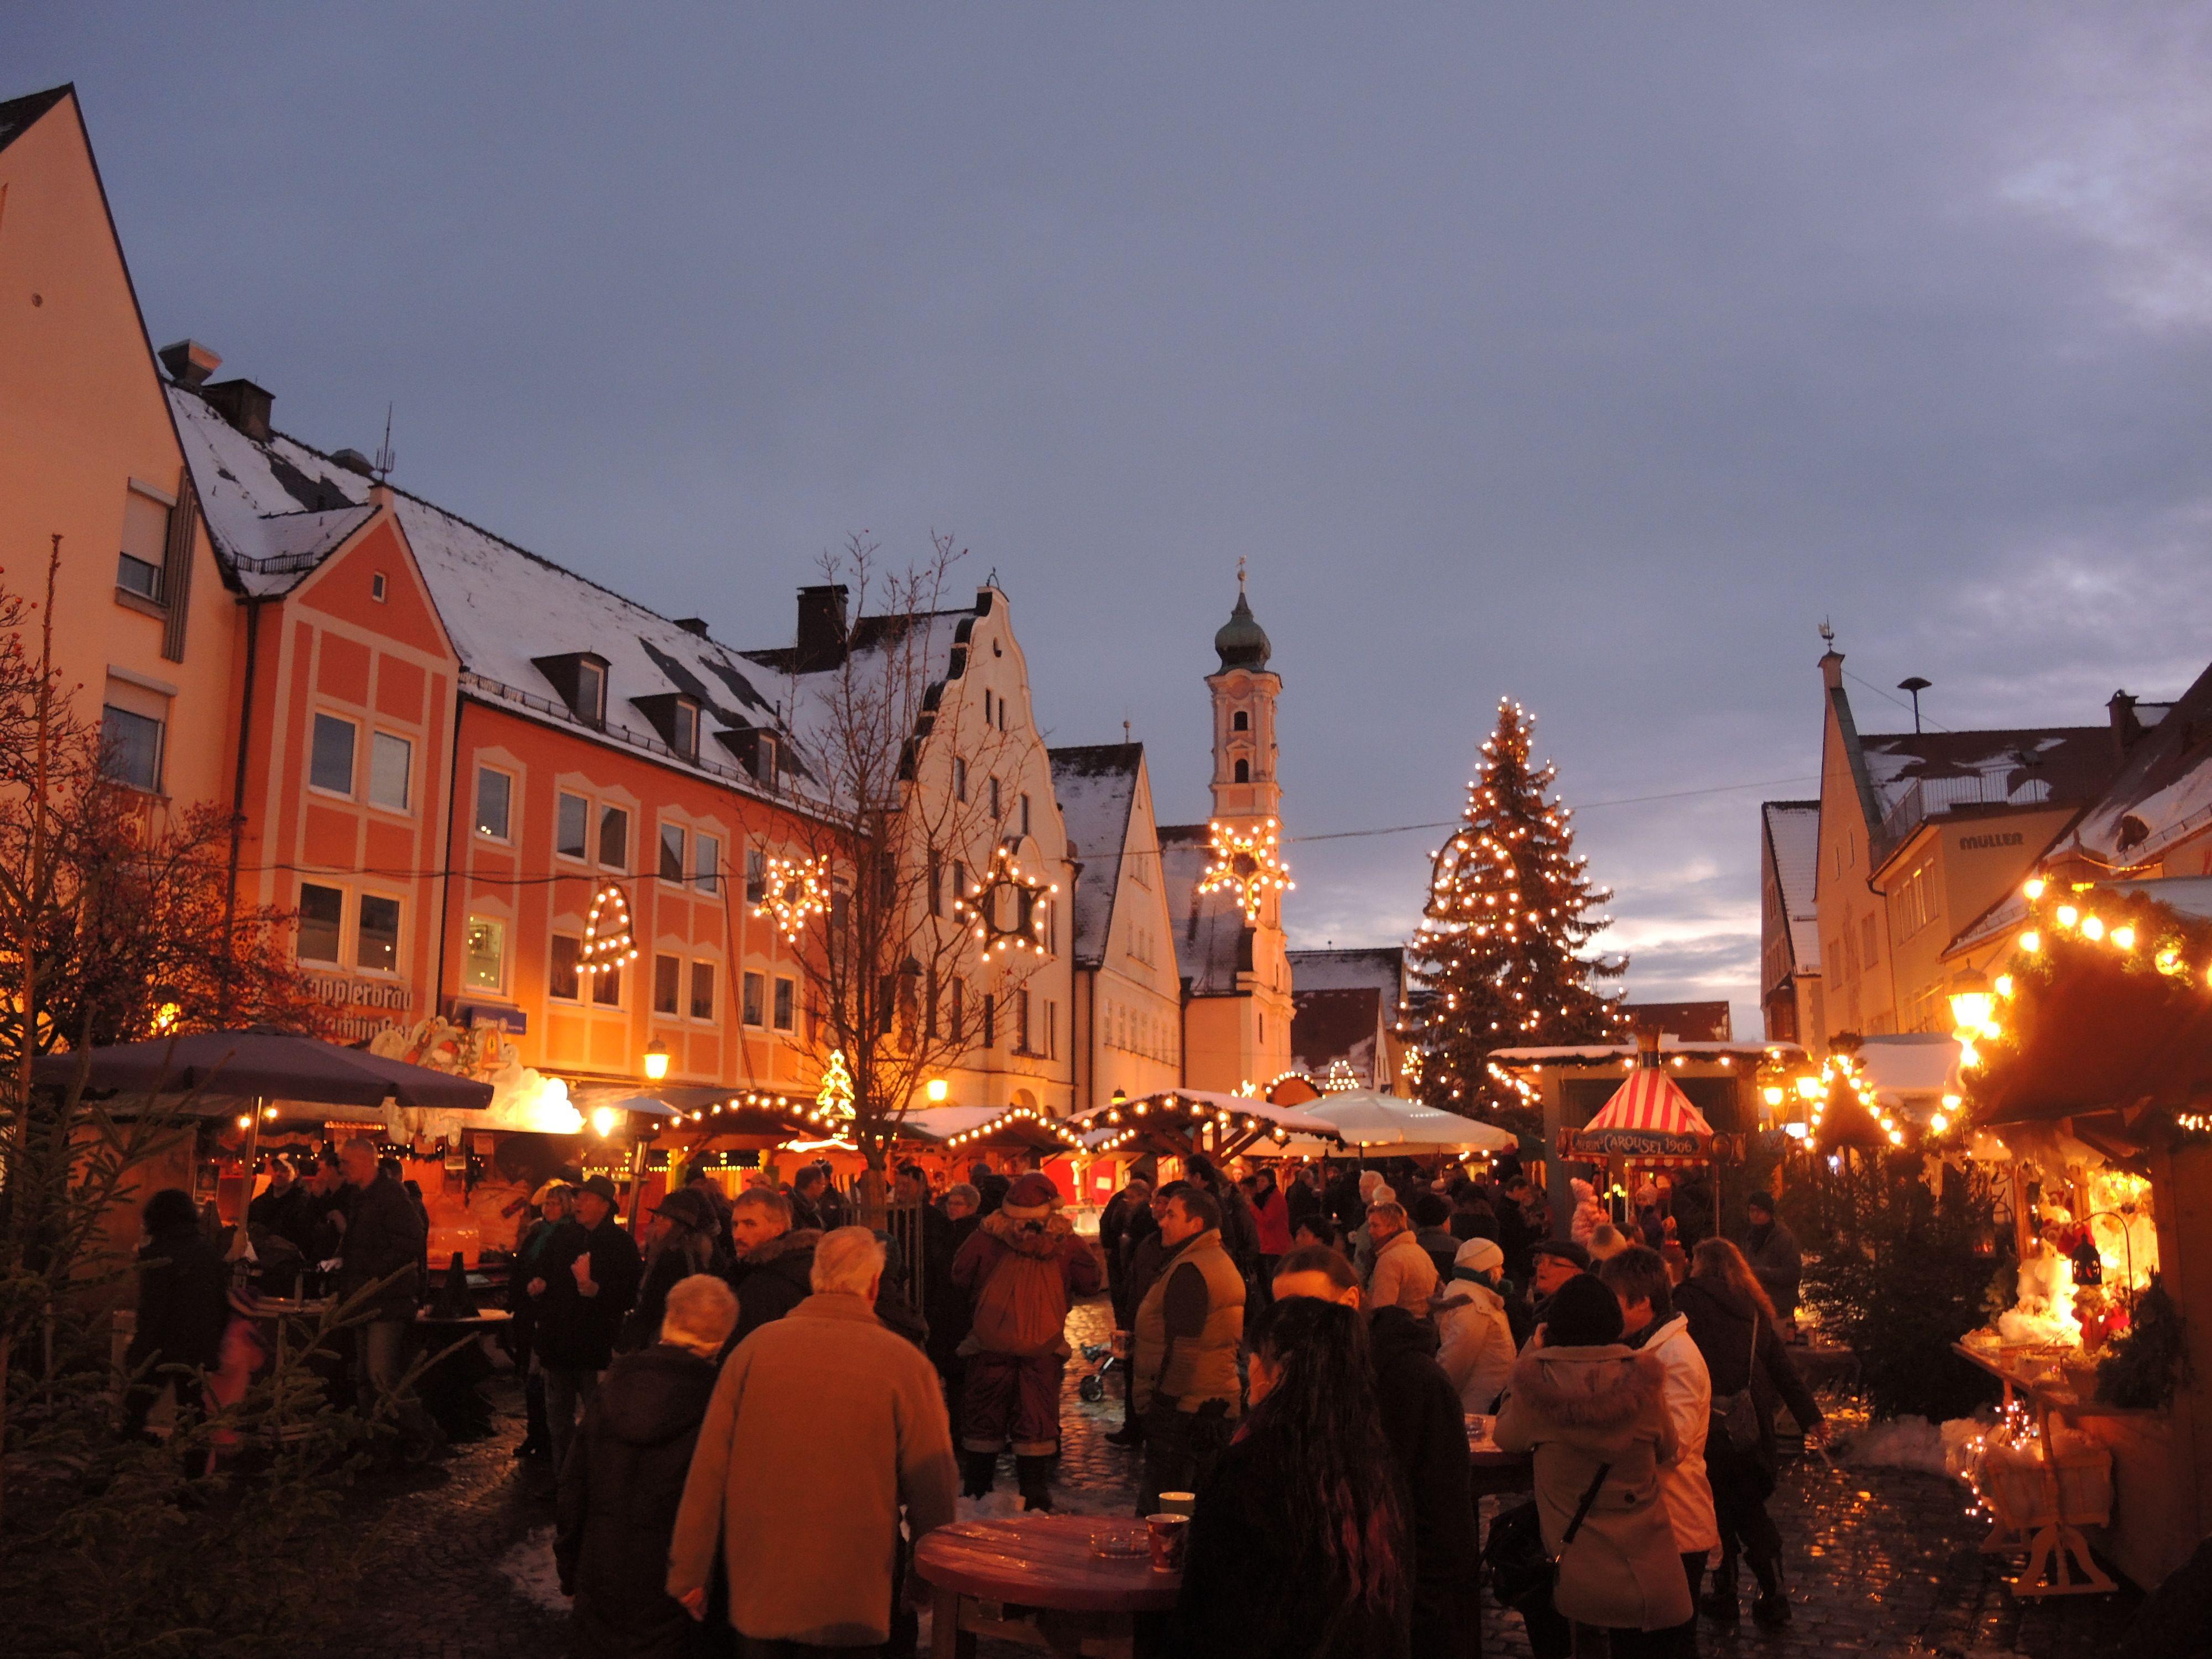 Weihnachtsmarkt Aichach.Weihnachtsmarkt Aichach In Bayern Christmas Market Bavaria Germany